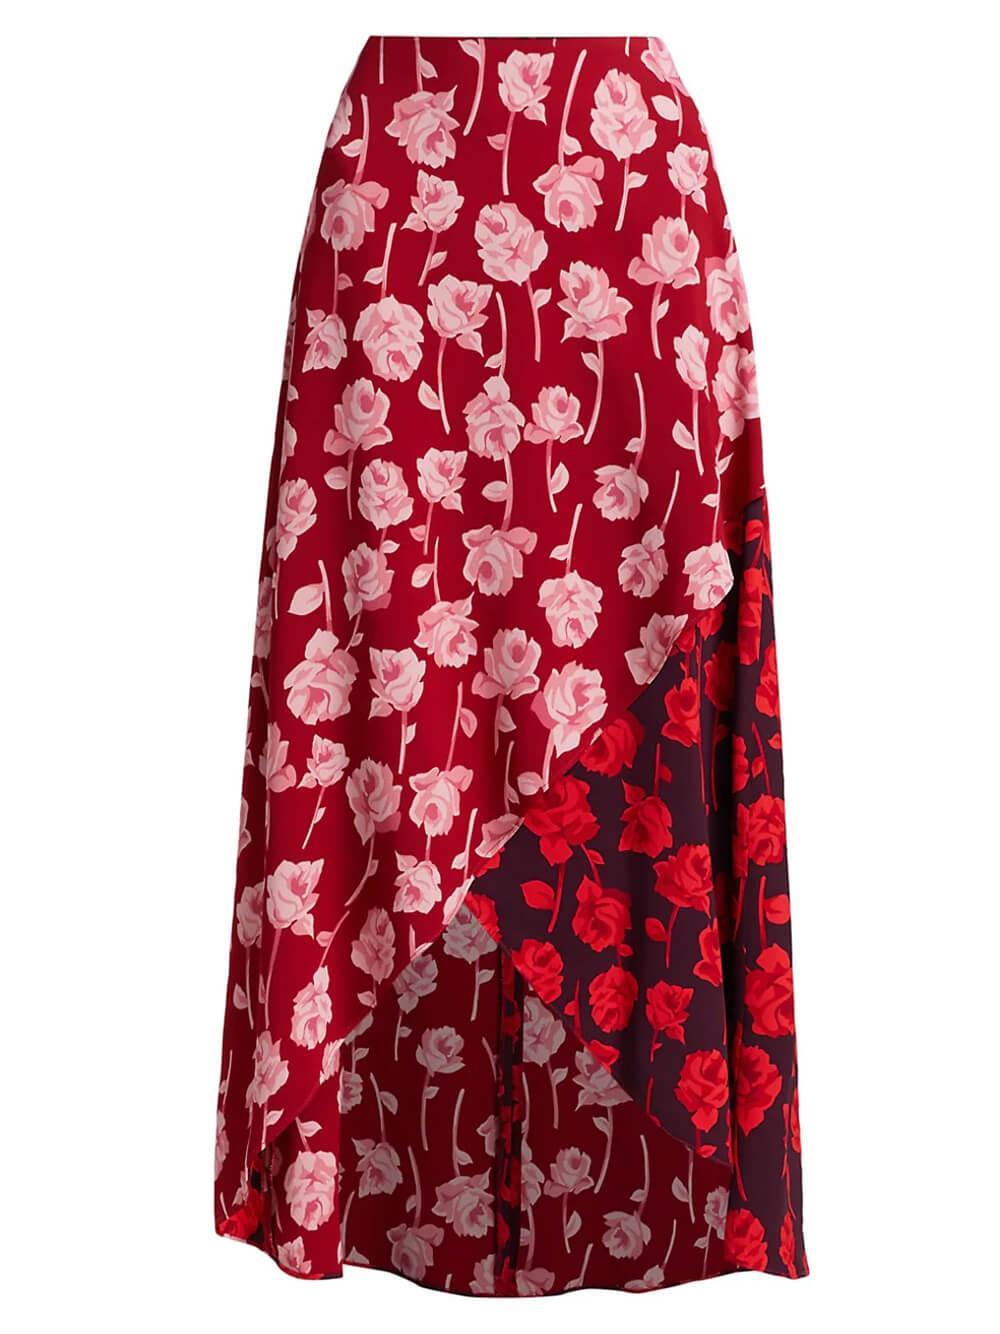 Mixed Rose Print Midi Skirt Item # F211451